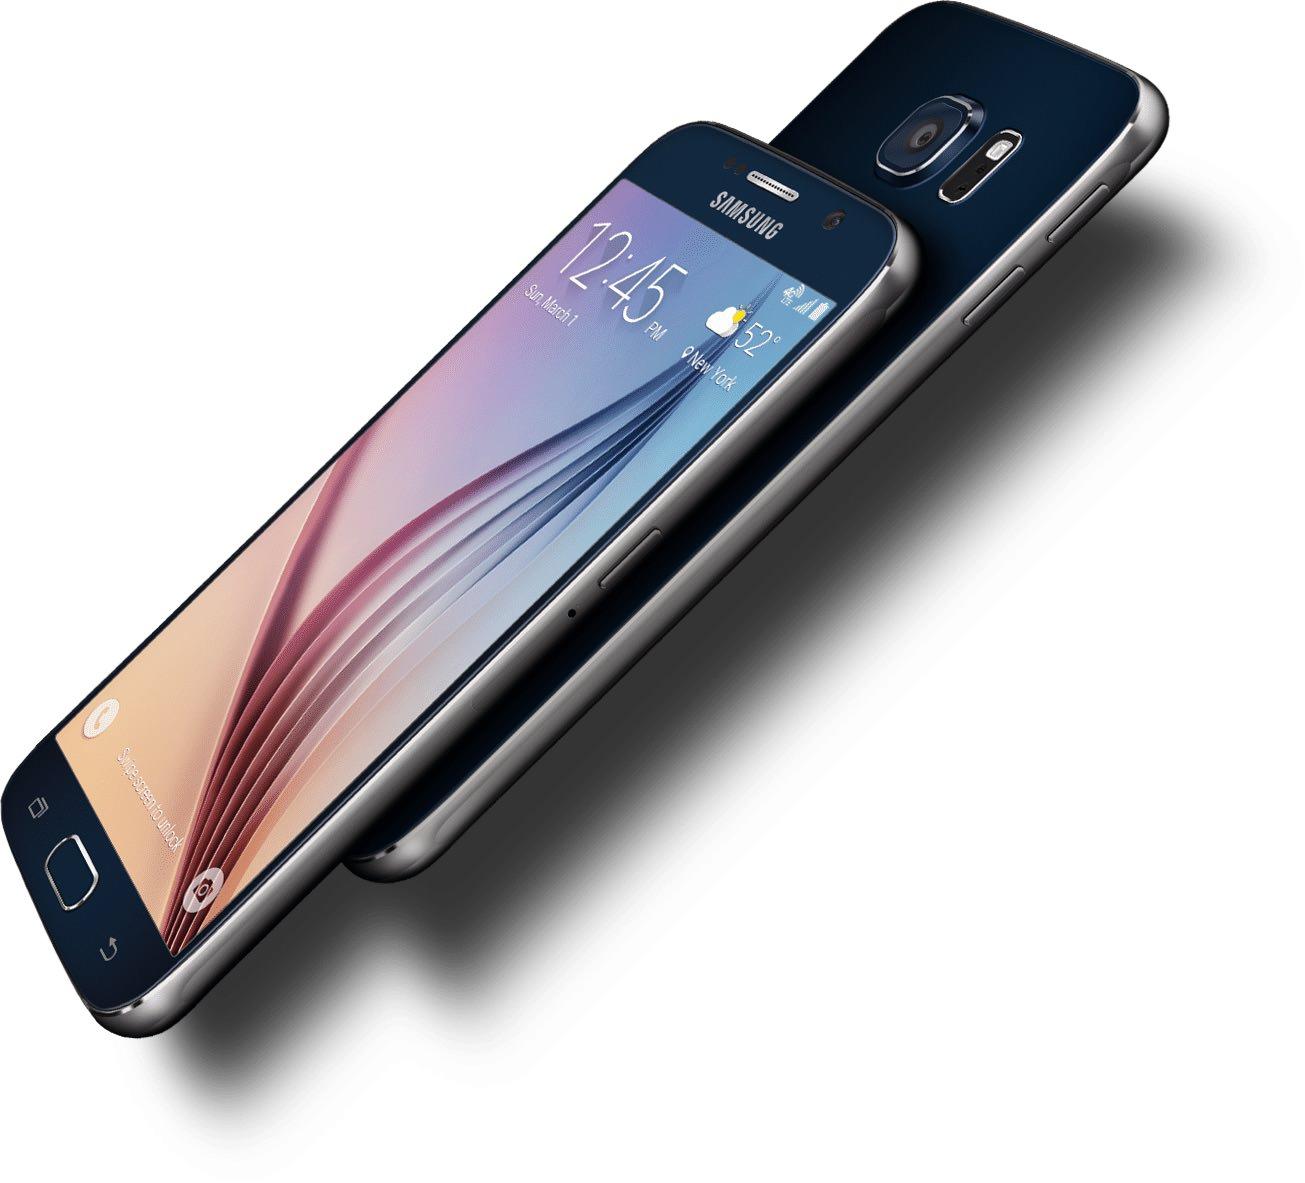 Samgung Galaxy S6